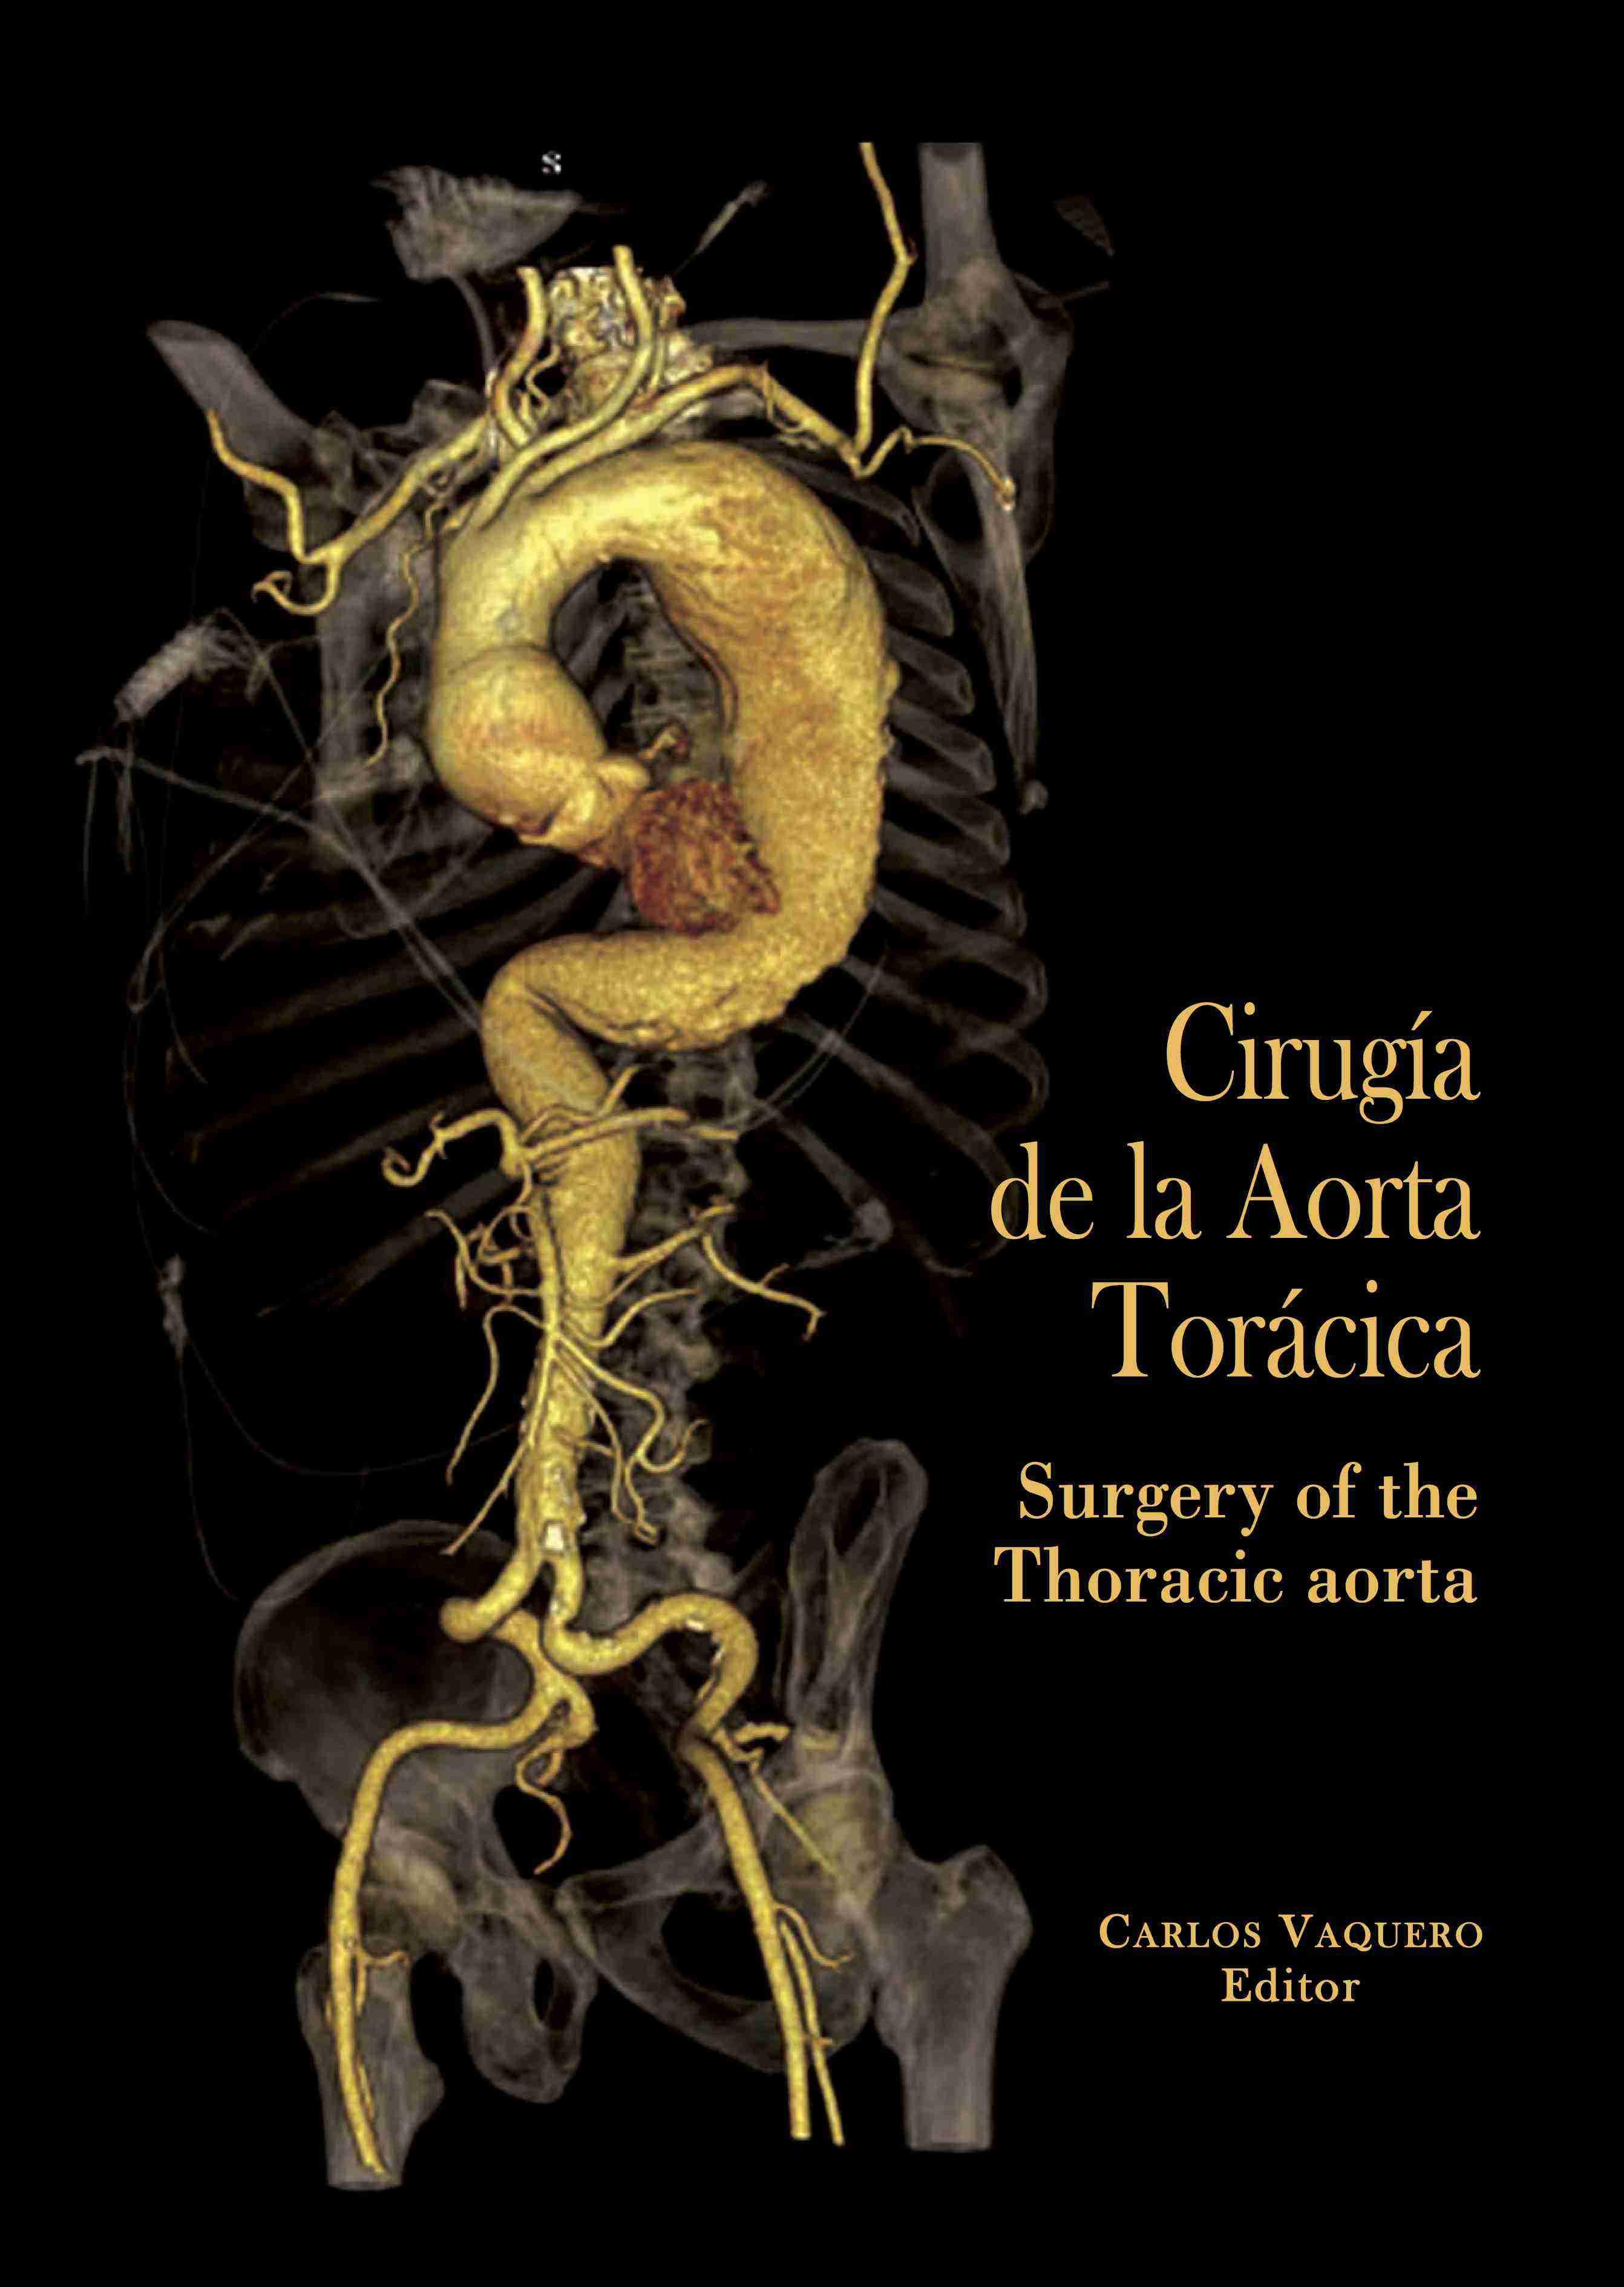 cirugia-de-la-aorta-toracica